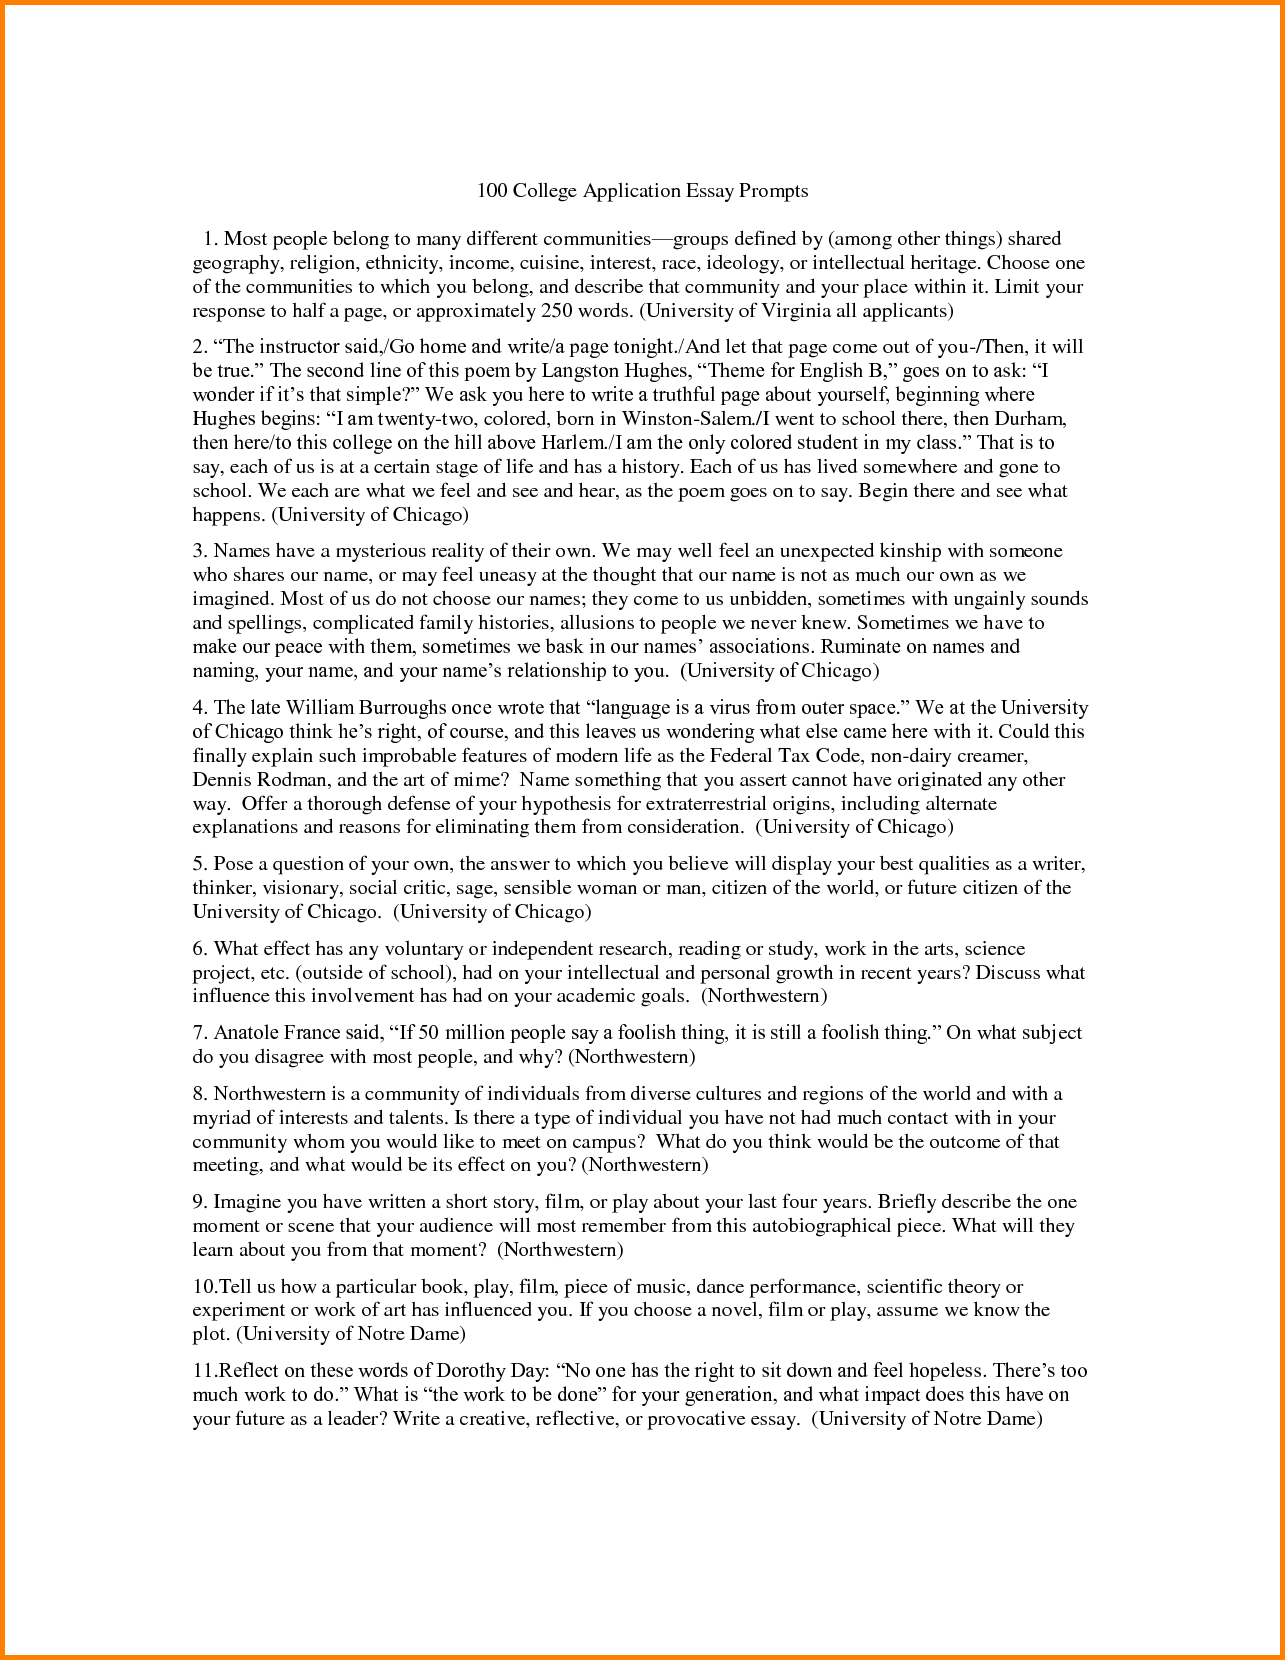 007 Essay Example Scholarship Essays On Future Goals College Prompts L Magnificent Robertson 2018-19 Vanderbilt Washington And Lee Johnson Full